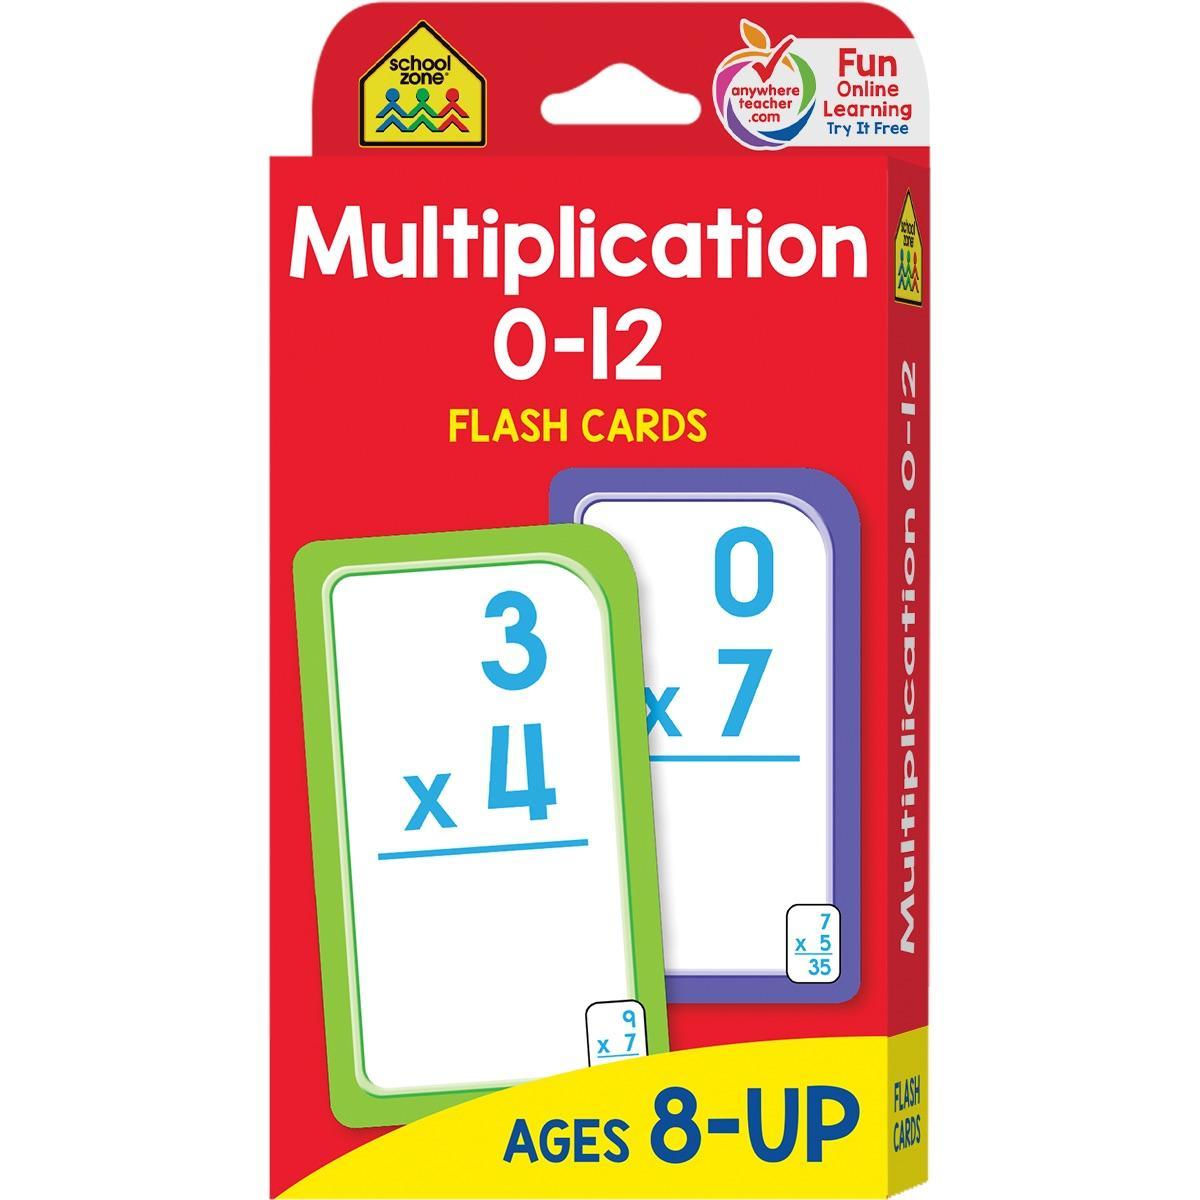 Flash Card: Multiplication 0 -12: Flashcards (Other) - Walmart